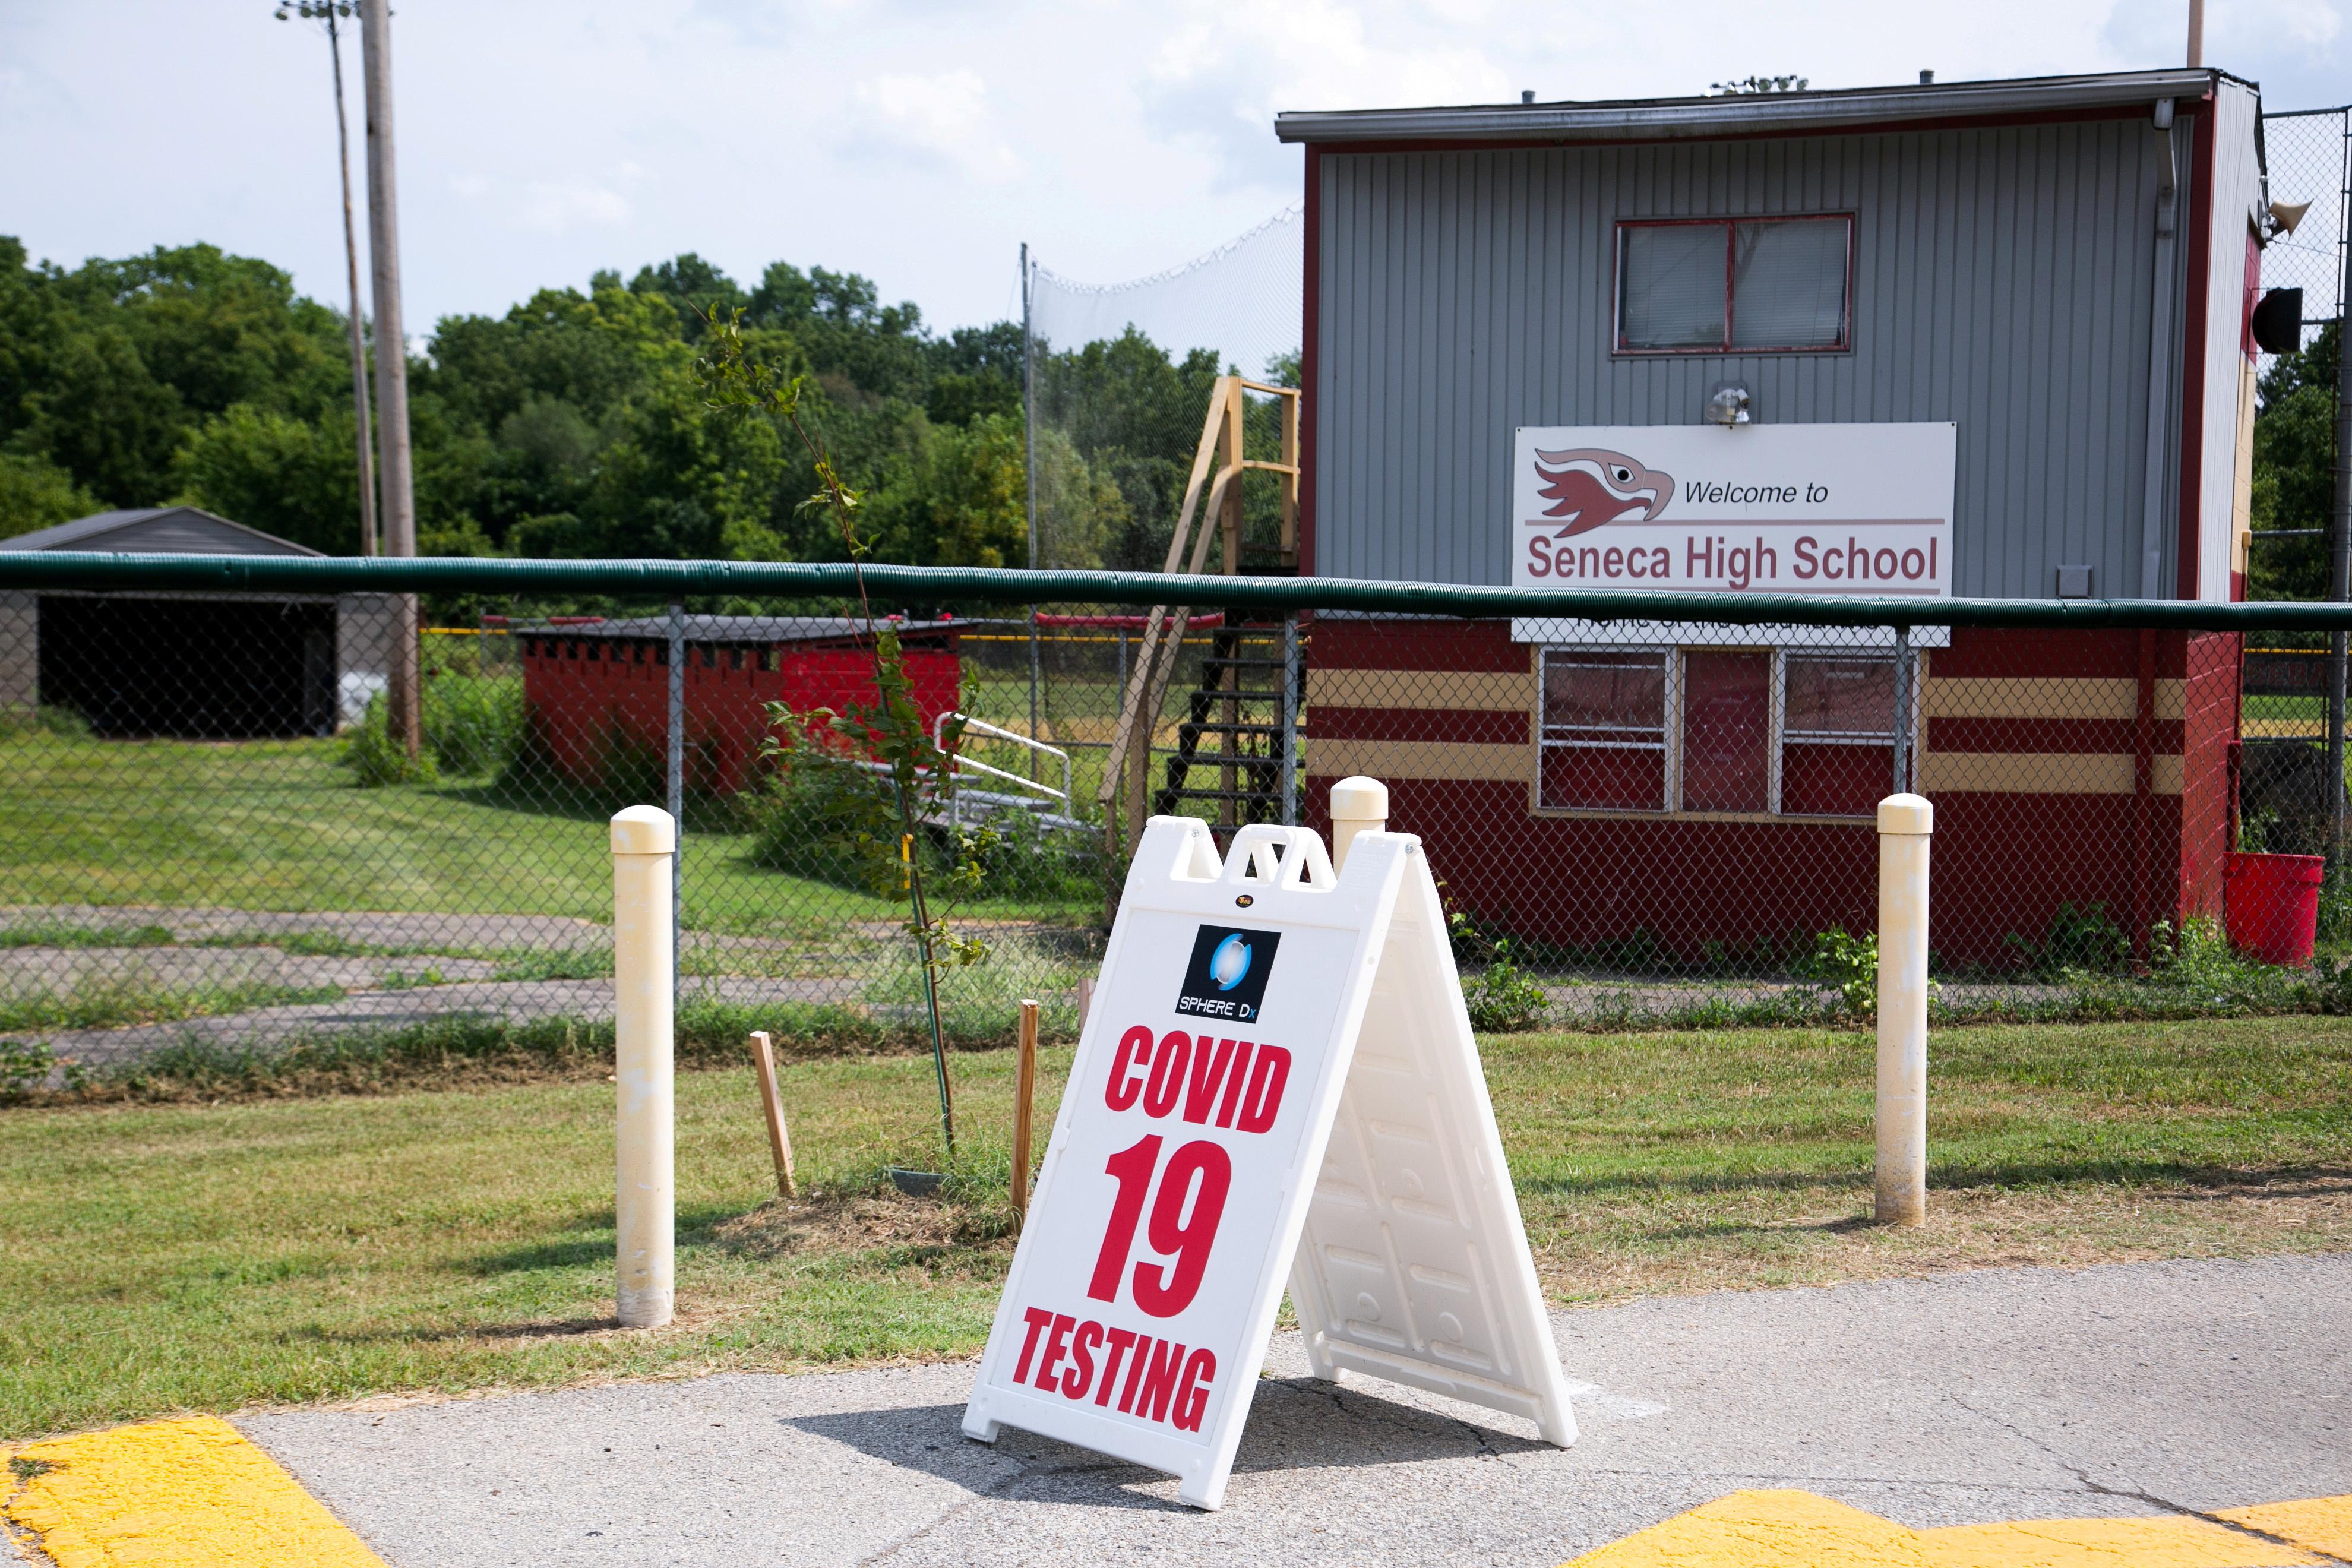 A coronavirus disease (COVID-19) testing sign is seen in front of Seneca High School, a day before returning to school in Louisville, Kentucky, U.S., August 10, 2021.  REUTERS/Amira Karaoud/File Photo